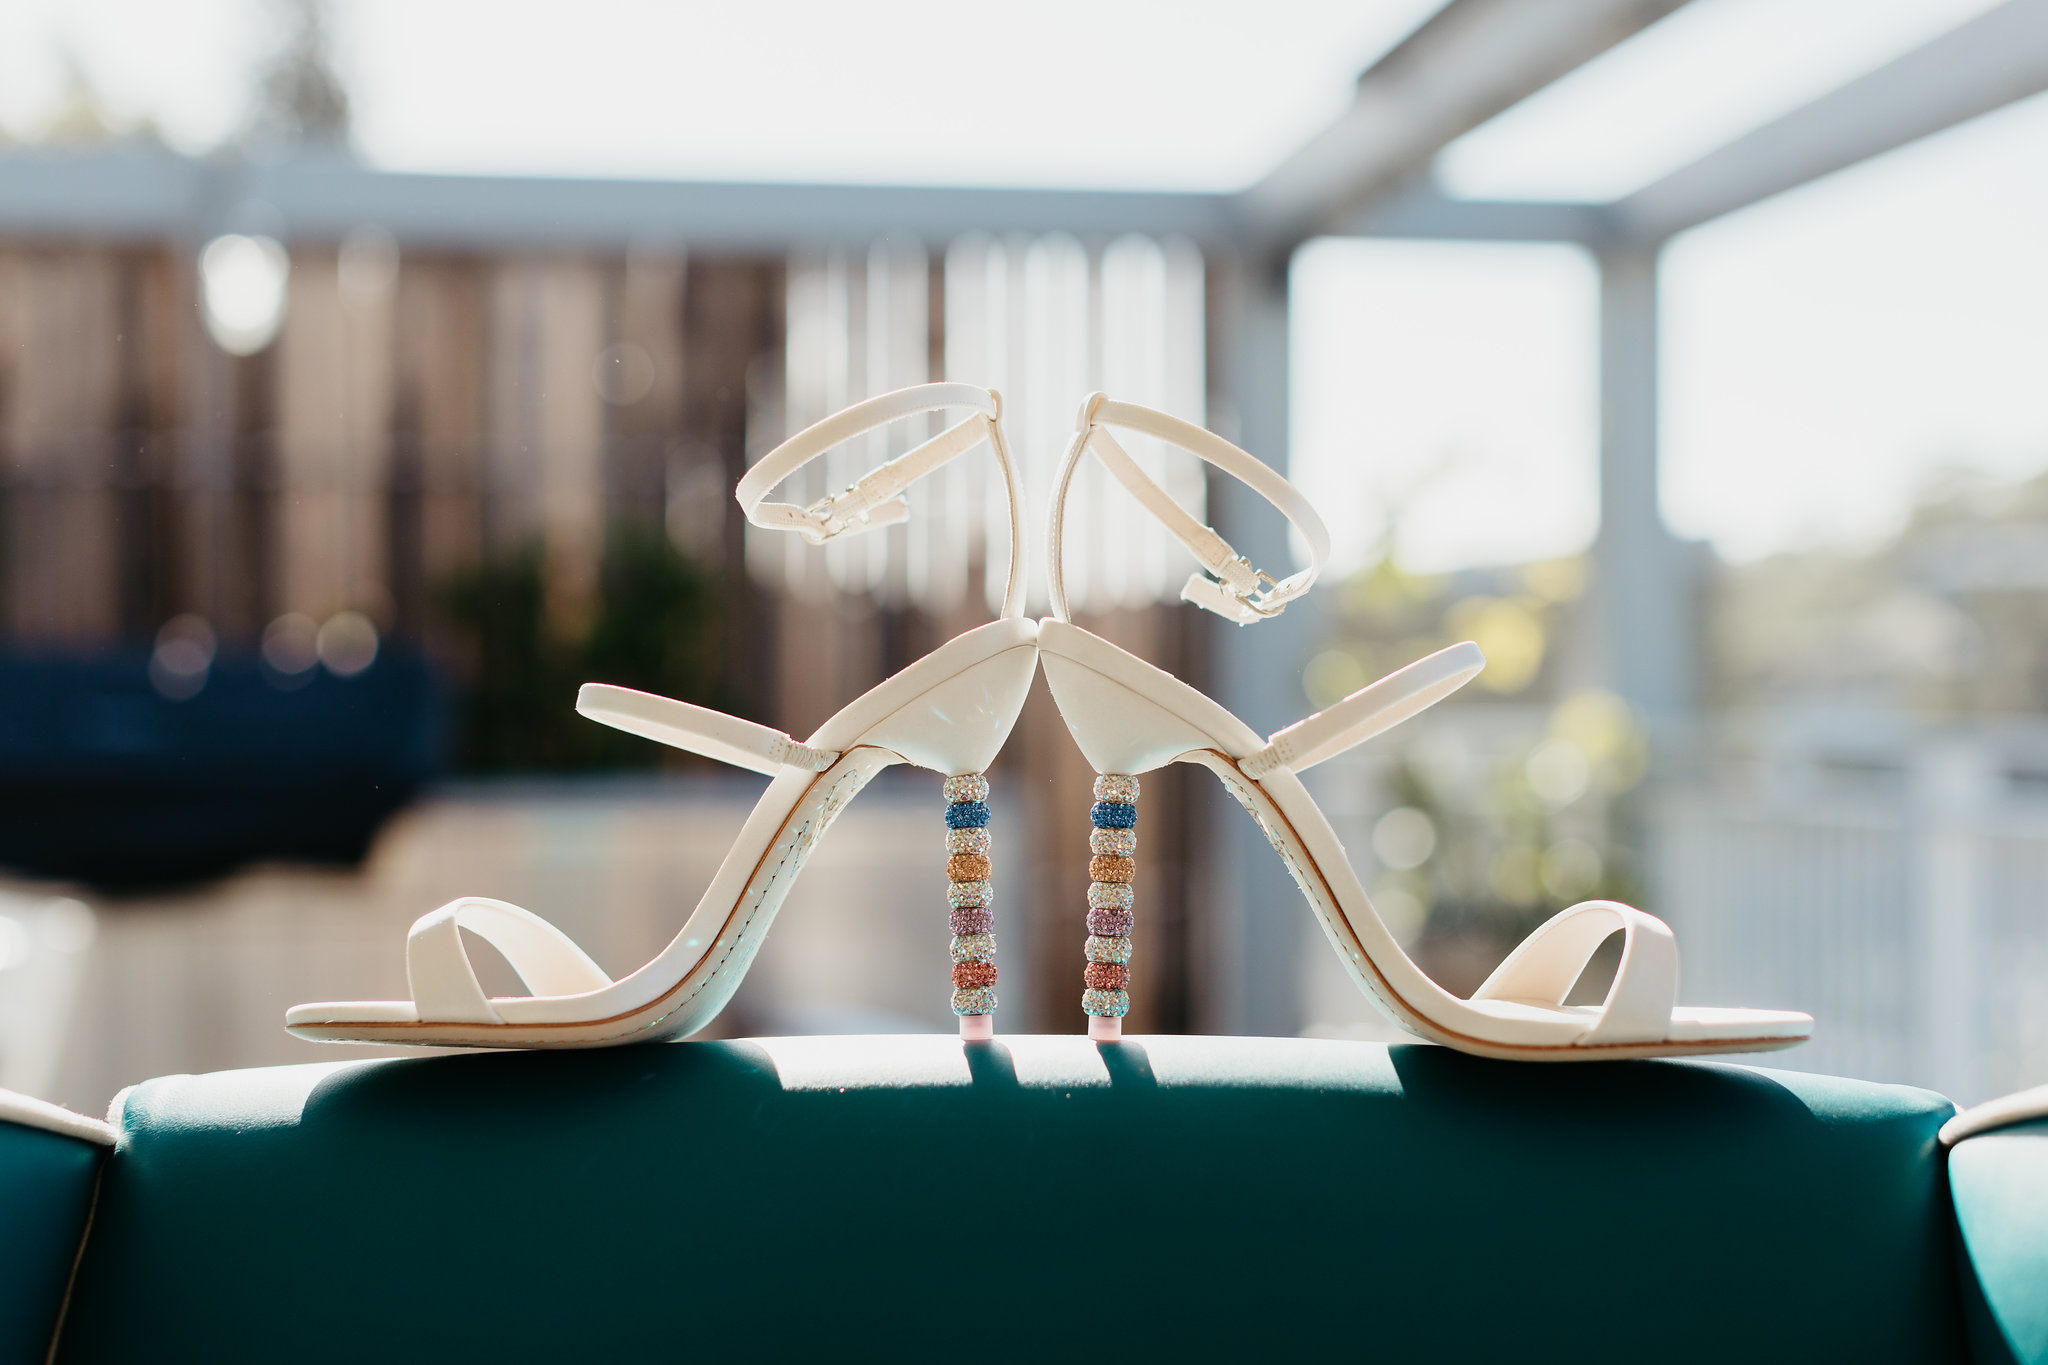 gen_chris_story_of_us_wedding-0115.JPG